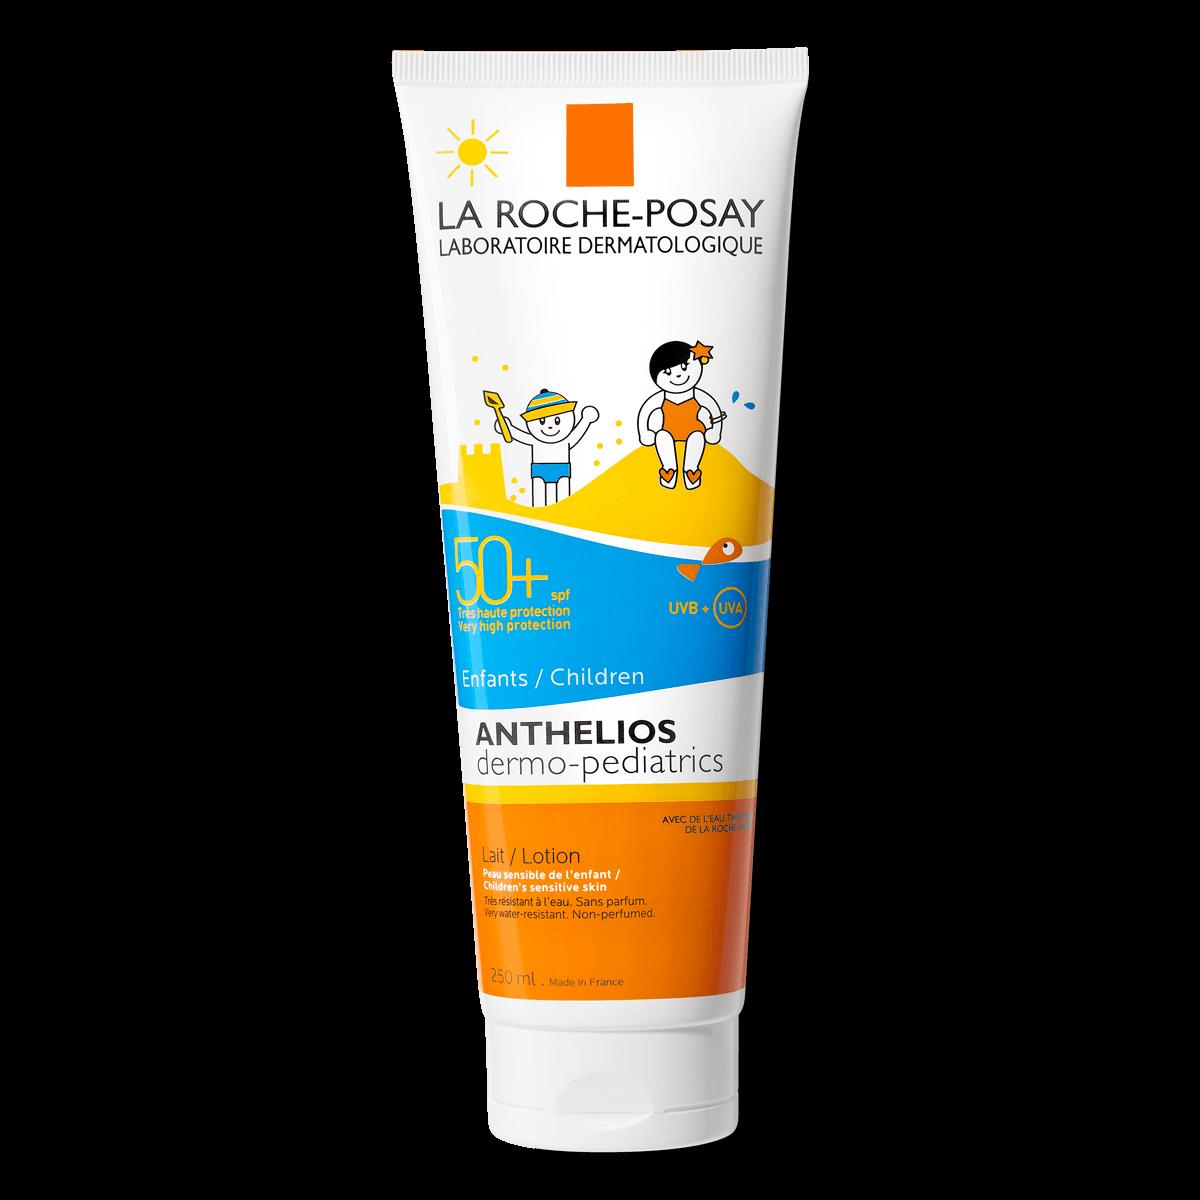 La Roche Posay ProductPage Sun Anthelios Dermo Pediatrics Spf50 Smooth